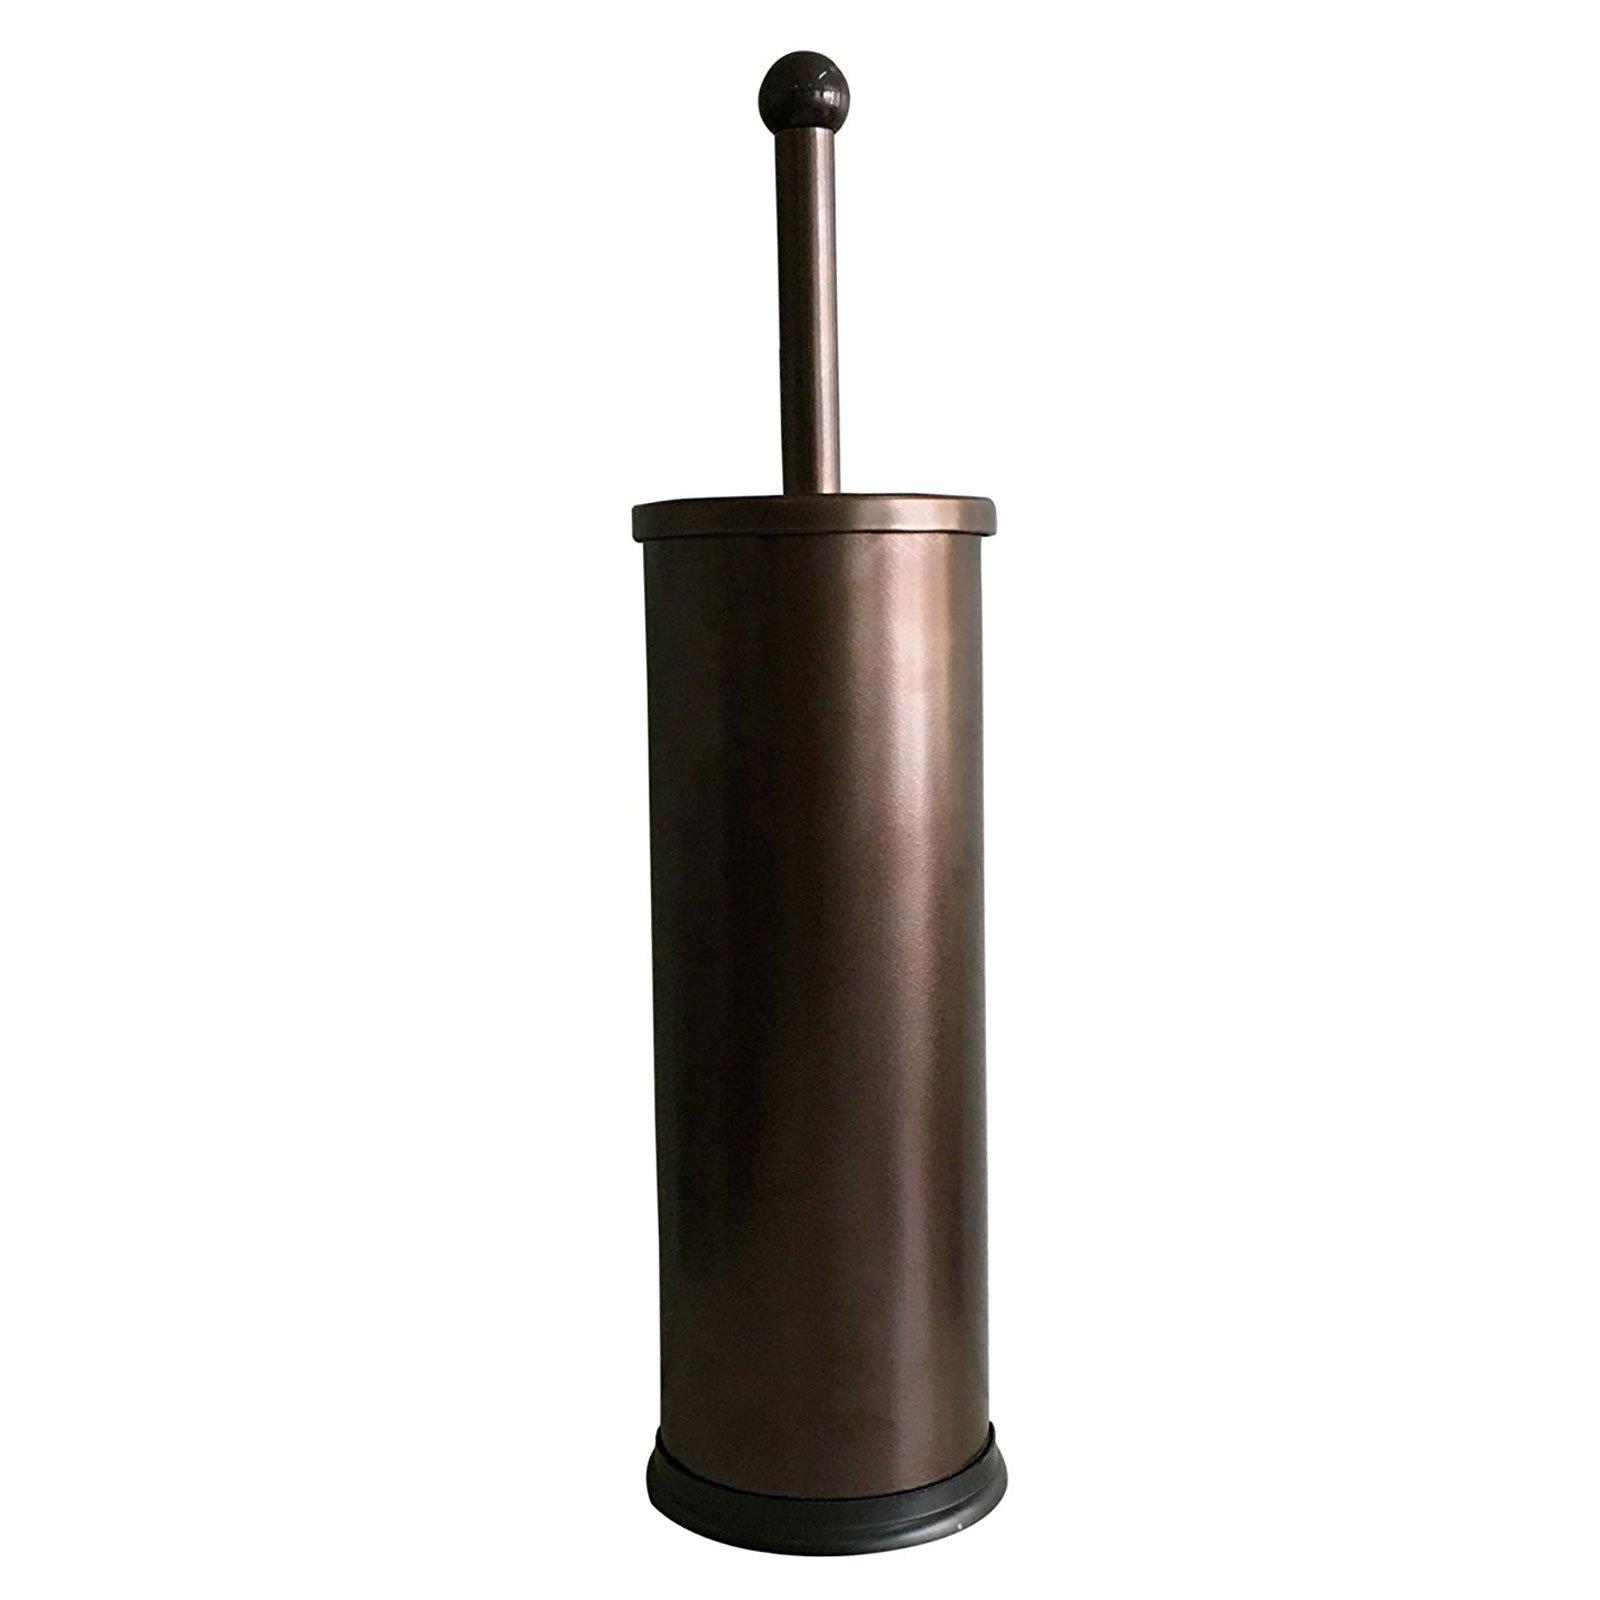 Cheap Bronze Toilet Brush, find Bronze Toilet Brush deals on line at ...